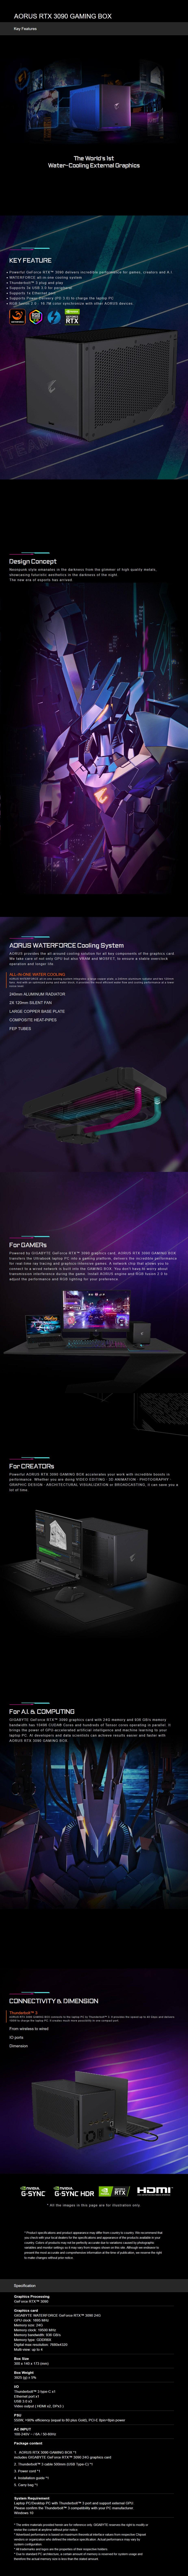 Gigabyte AORUS GeForce RTX 3090 WATERFORCE 24GB Gaming Box - Desktop Overview 1